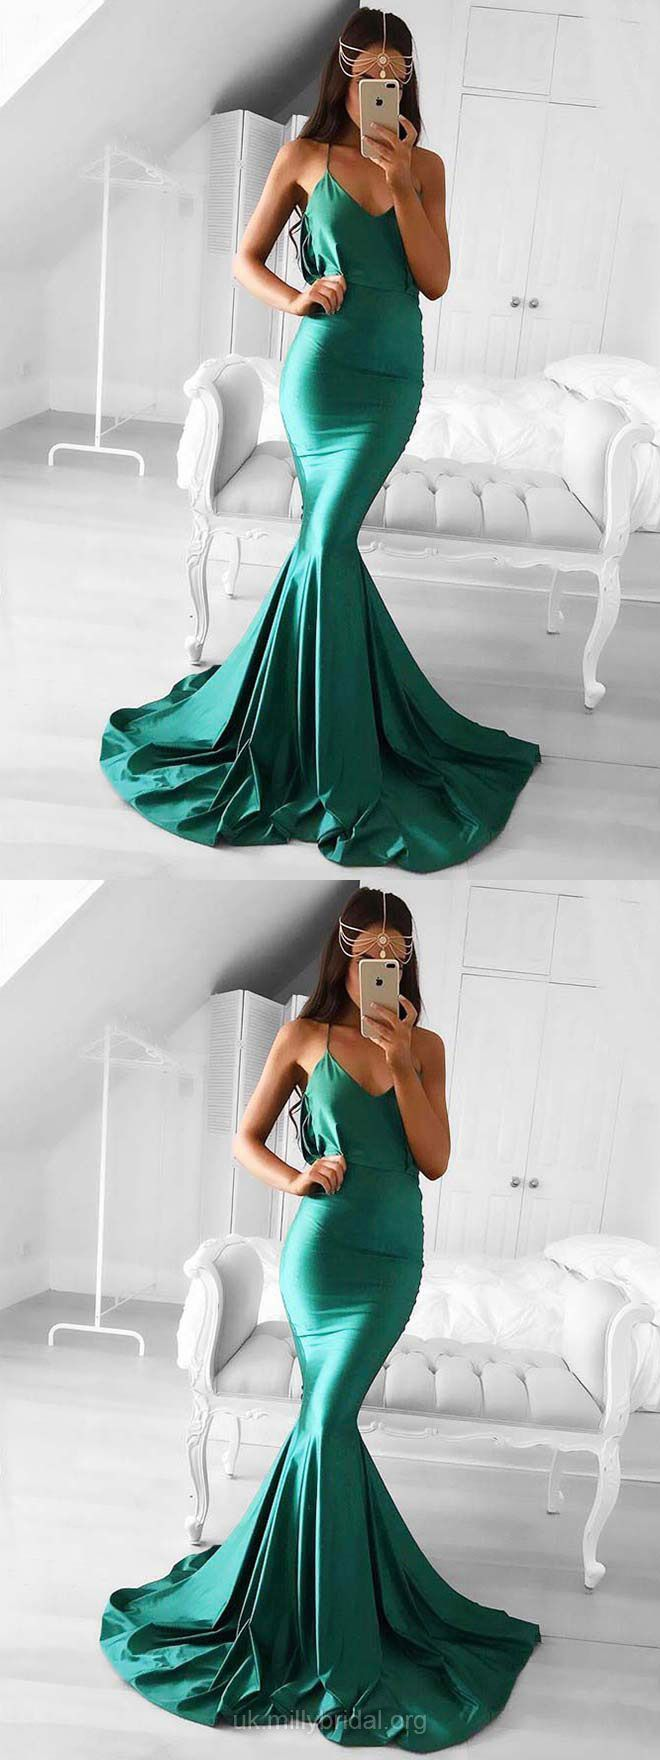 Long prom dresses mermaid green prom dresses teenagers prom